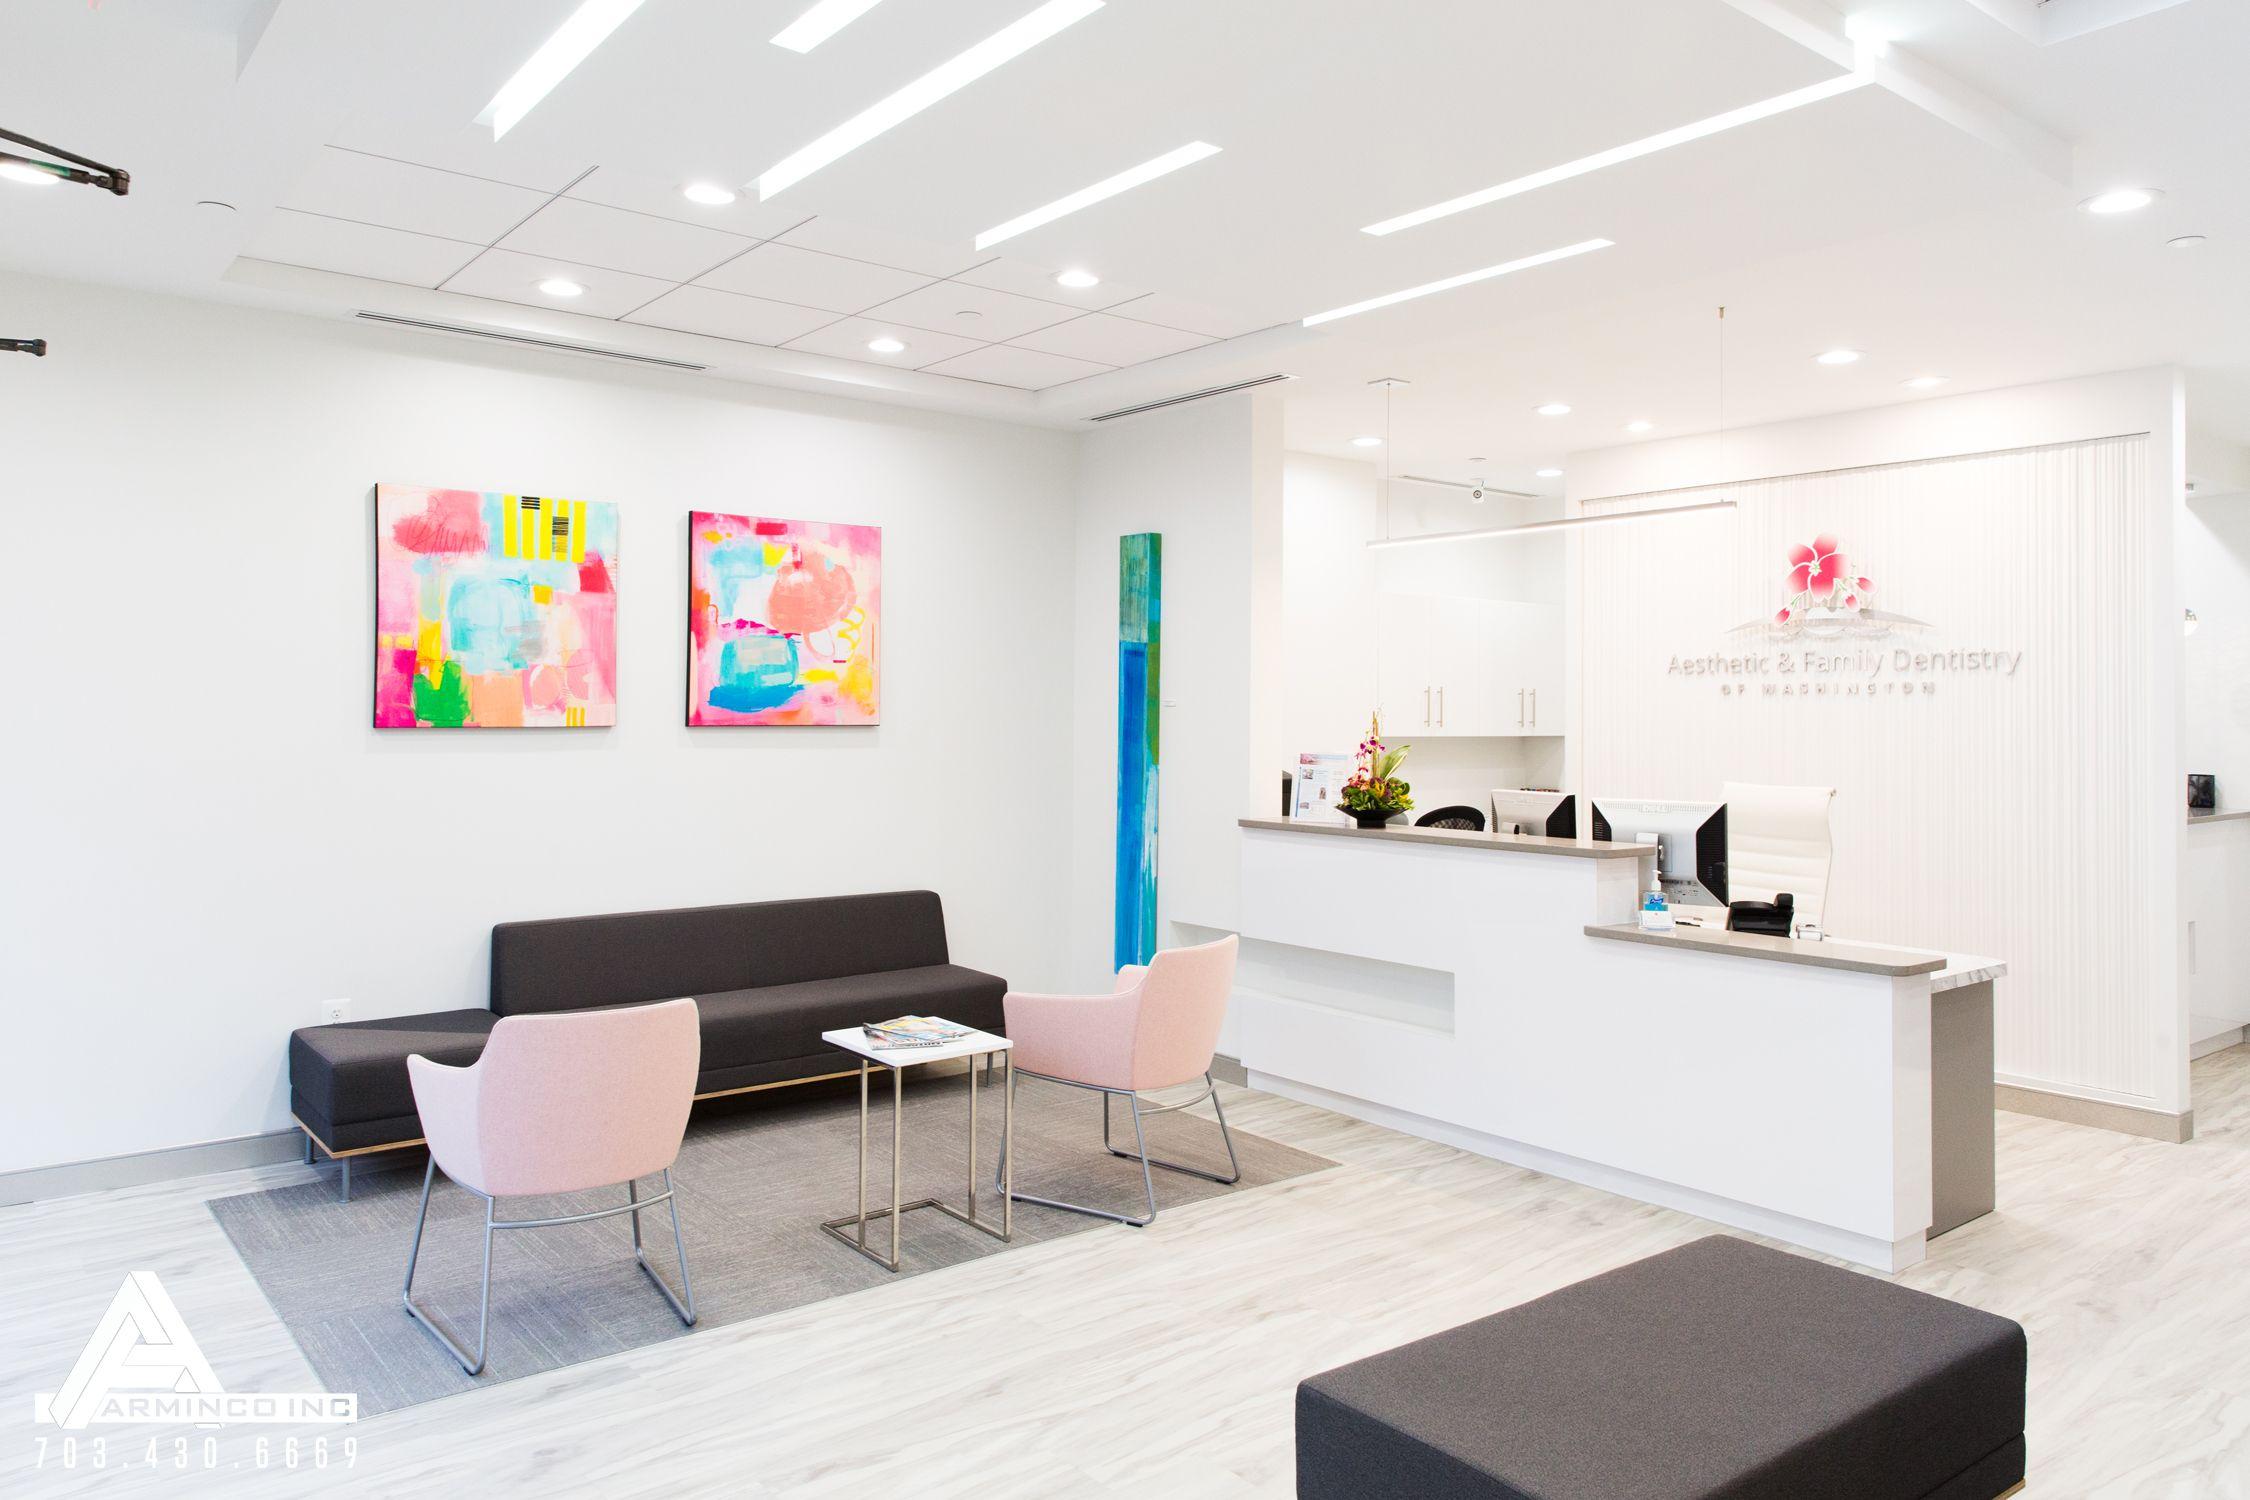 Arminco Inc- A Full Service Architectural Design Studio, Construction Management Firm,